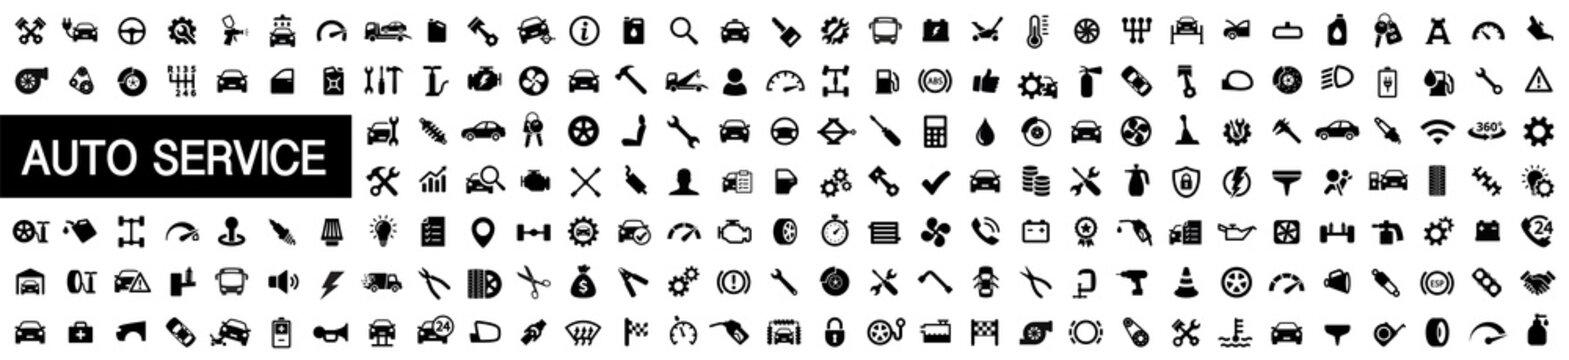 Auto service, car repair icon set. Car service and garage. Big collection: repair, maintenance, inspection, parts, units, elements - stock vector.